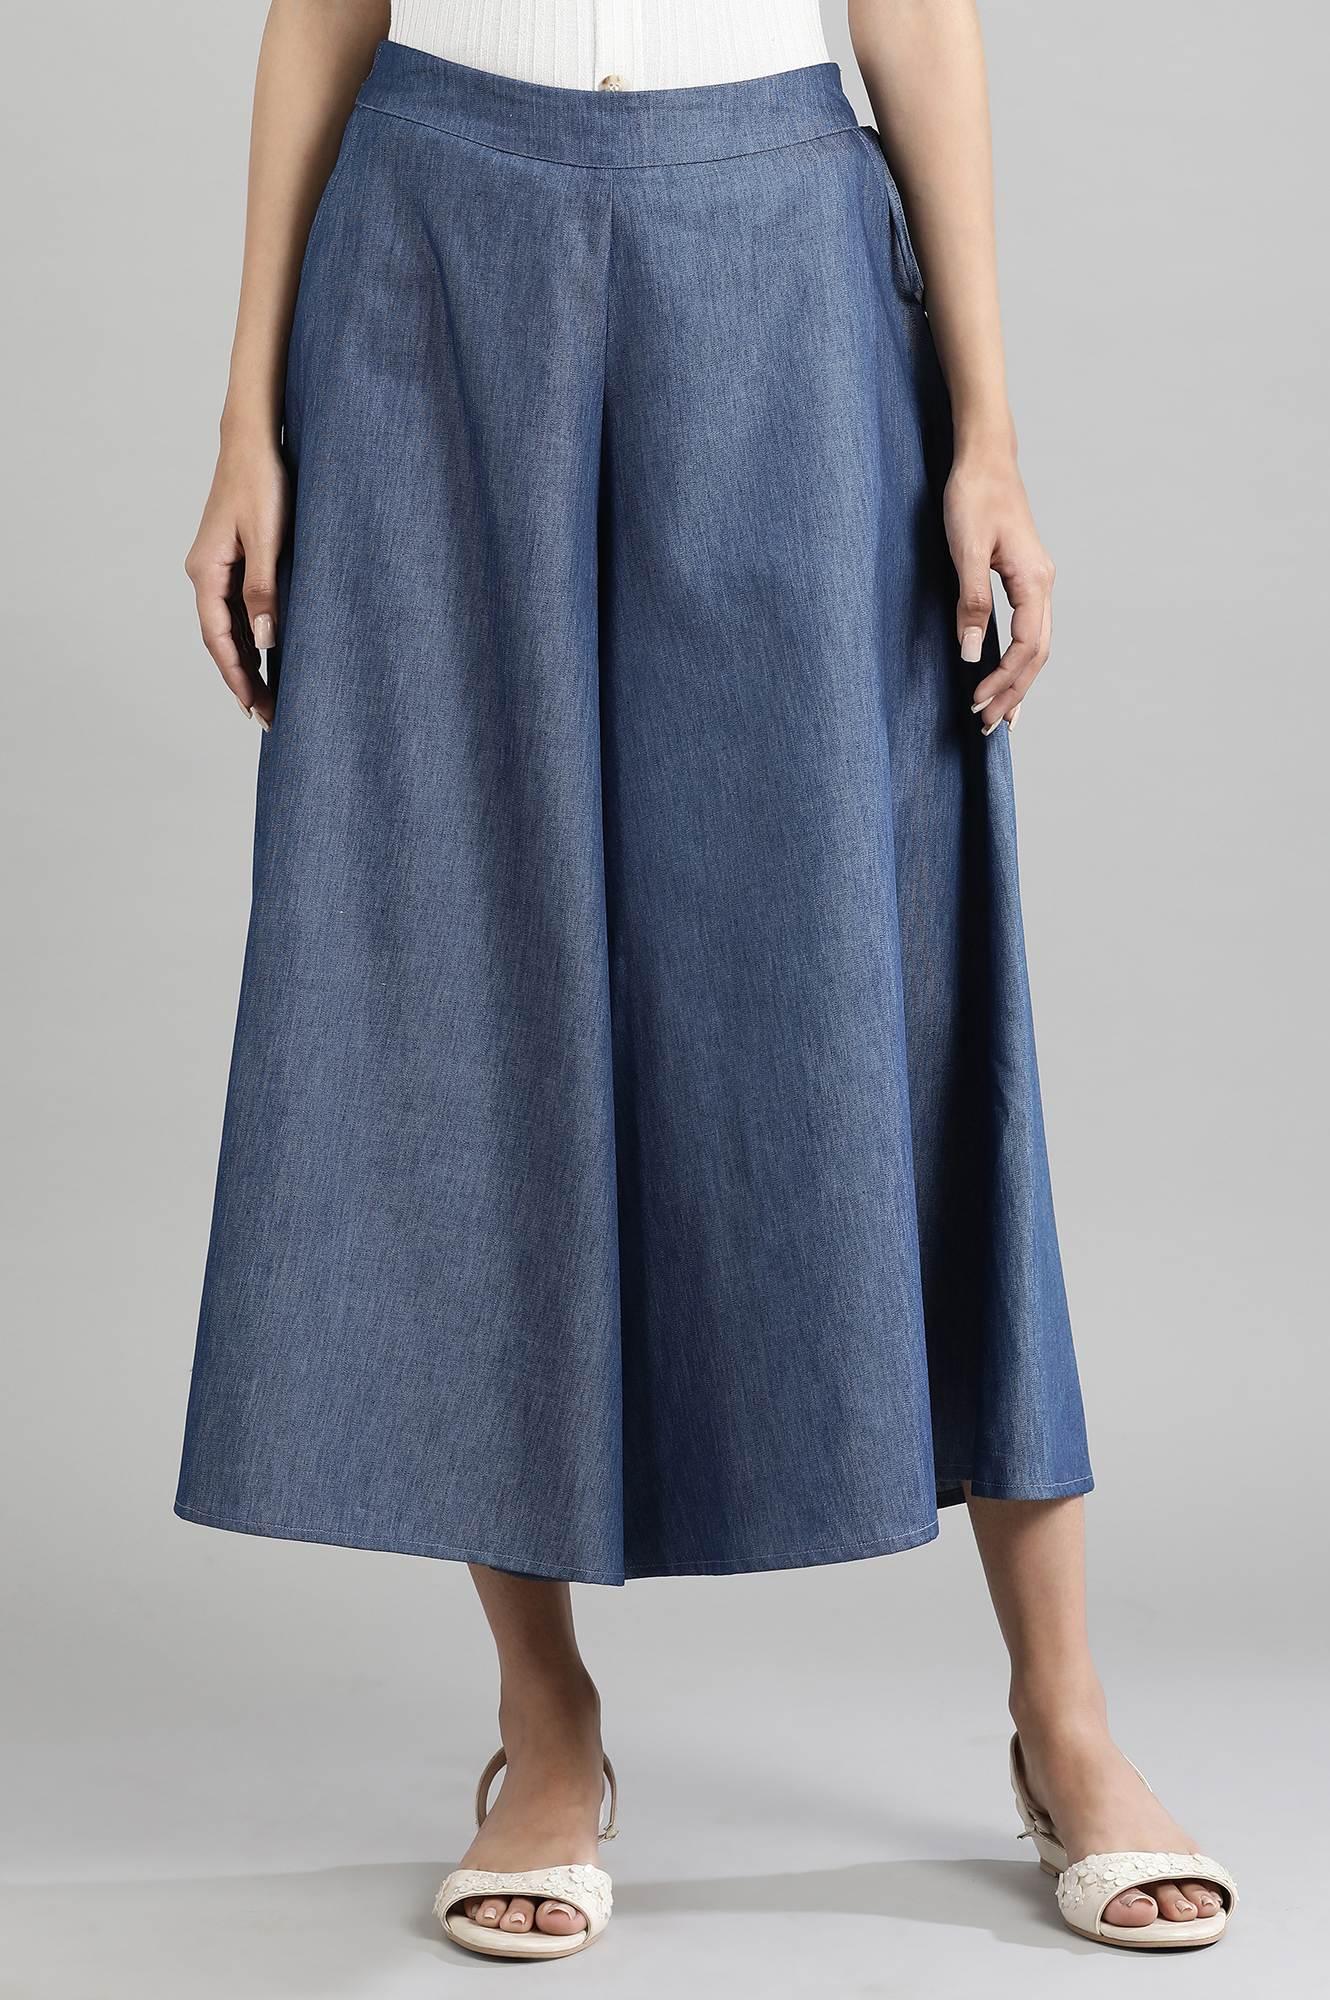 Aurelia | Blue Cotton Denim Culottes